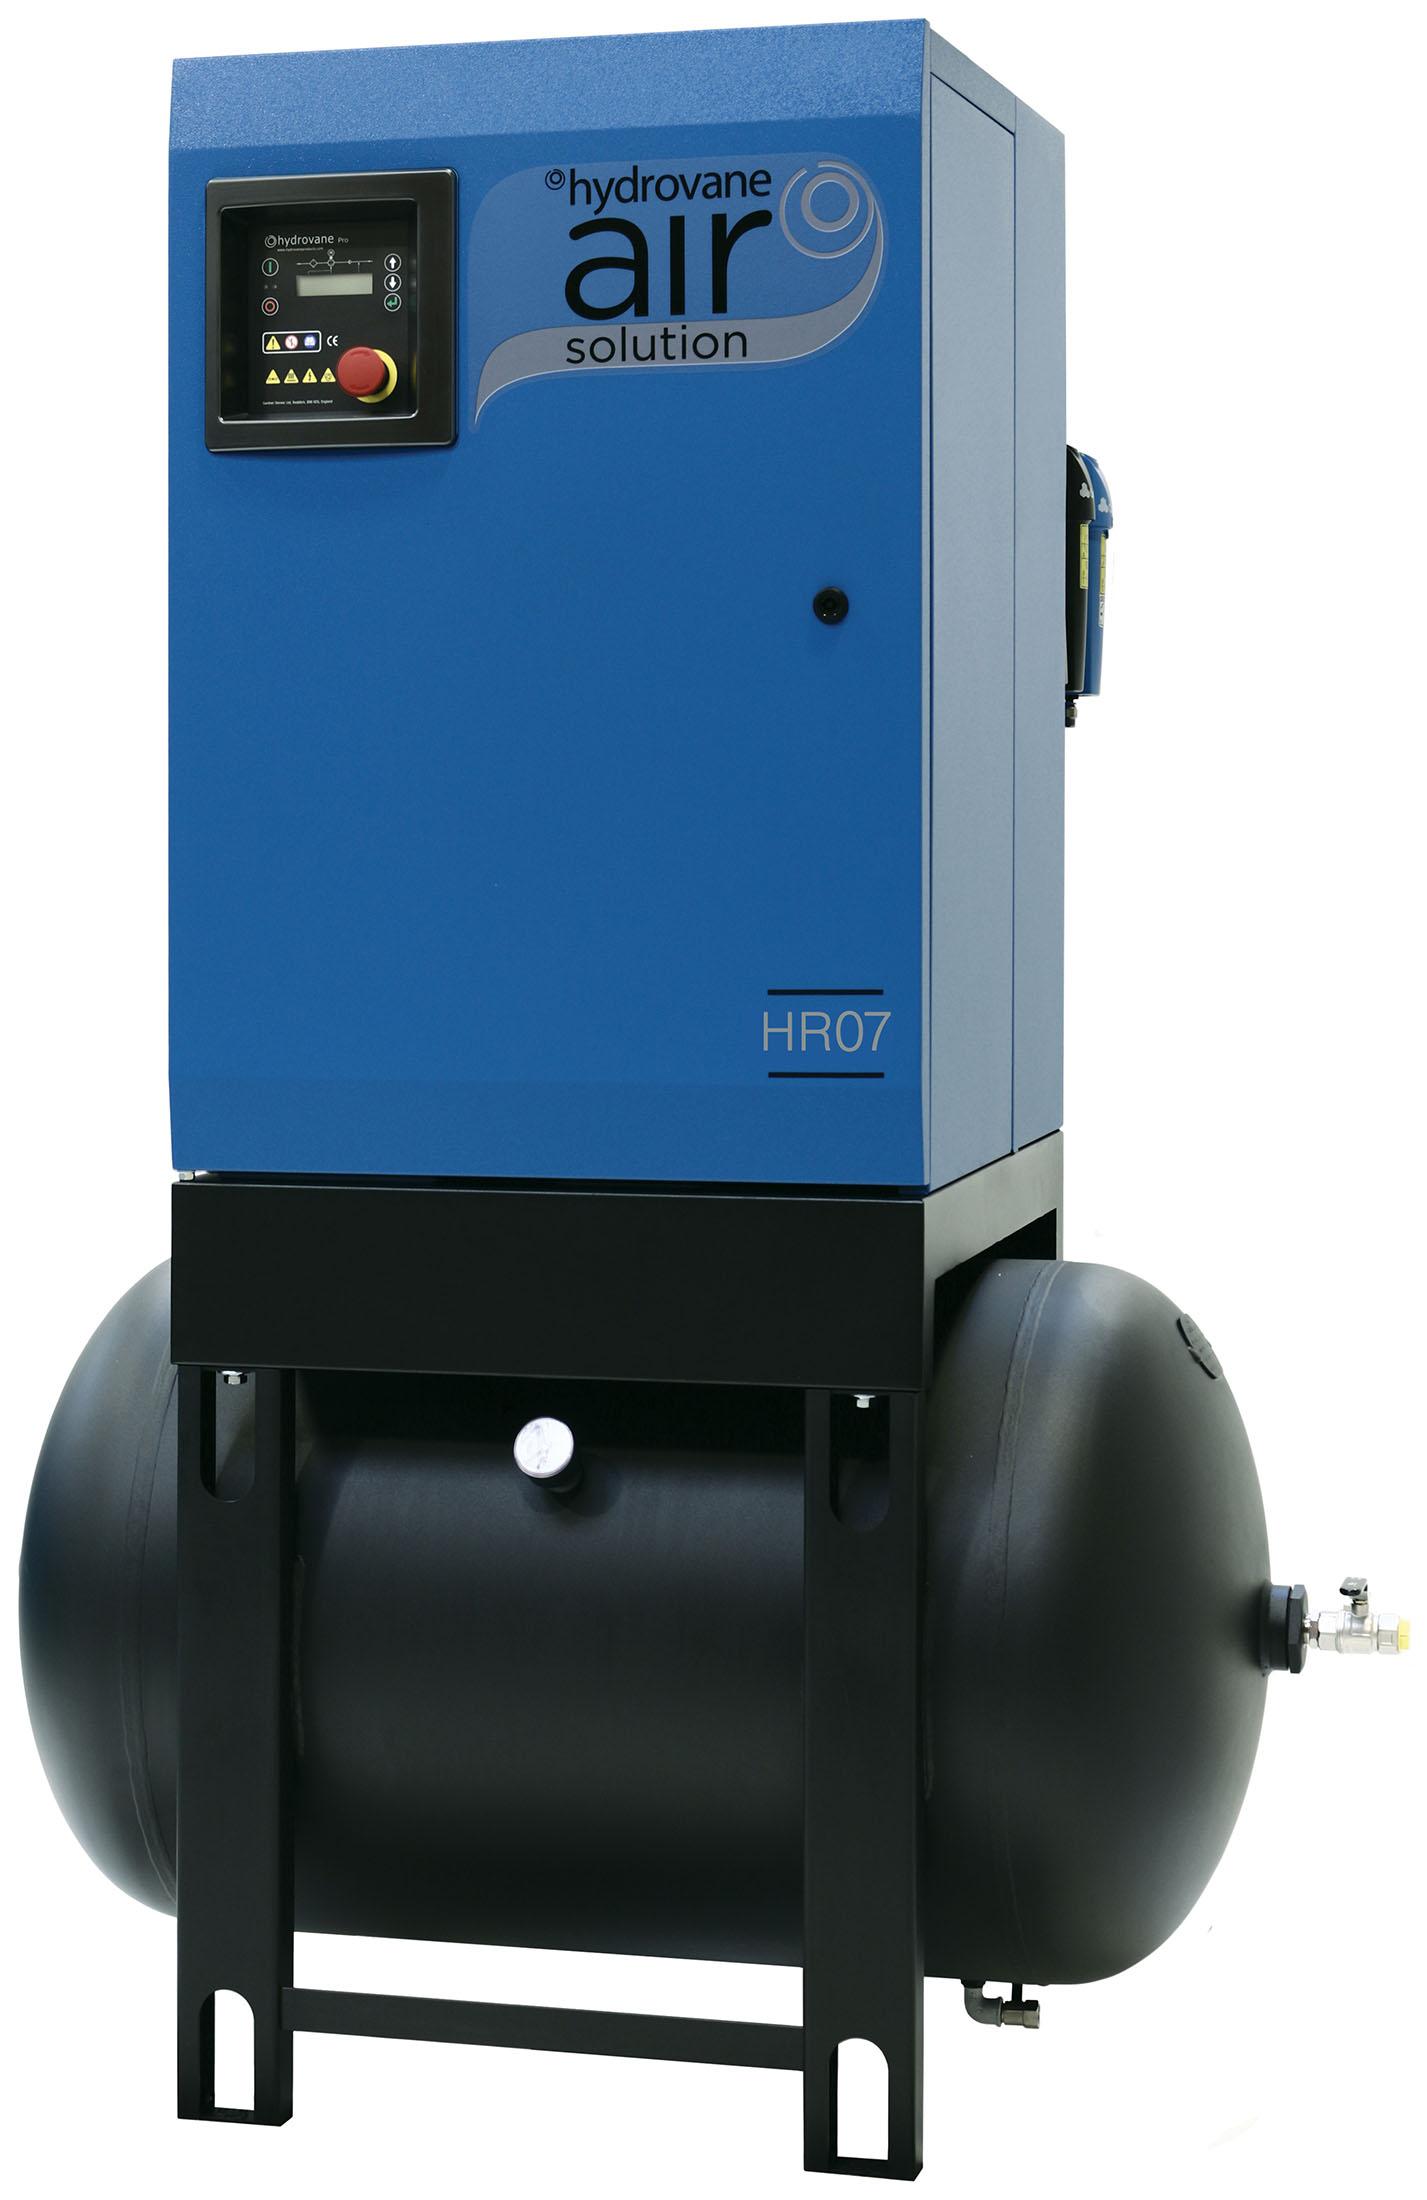 hr07 air compressor range hydrovane direct air rh directair co uk